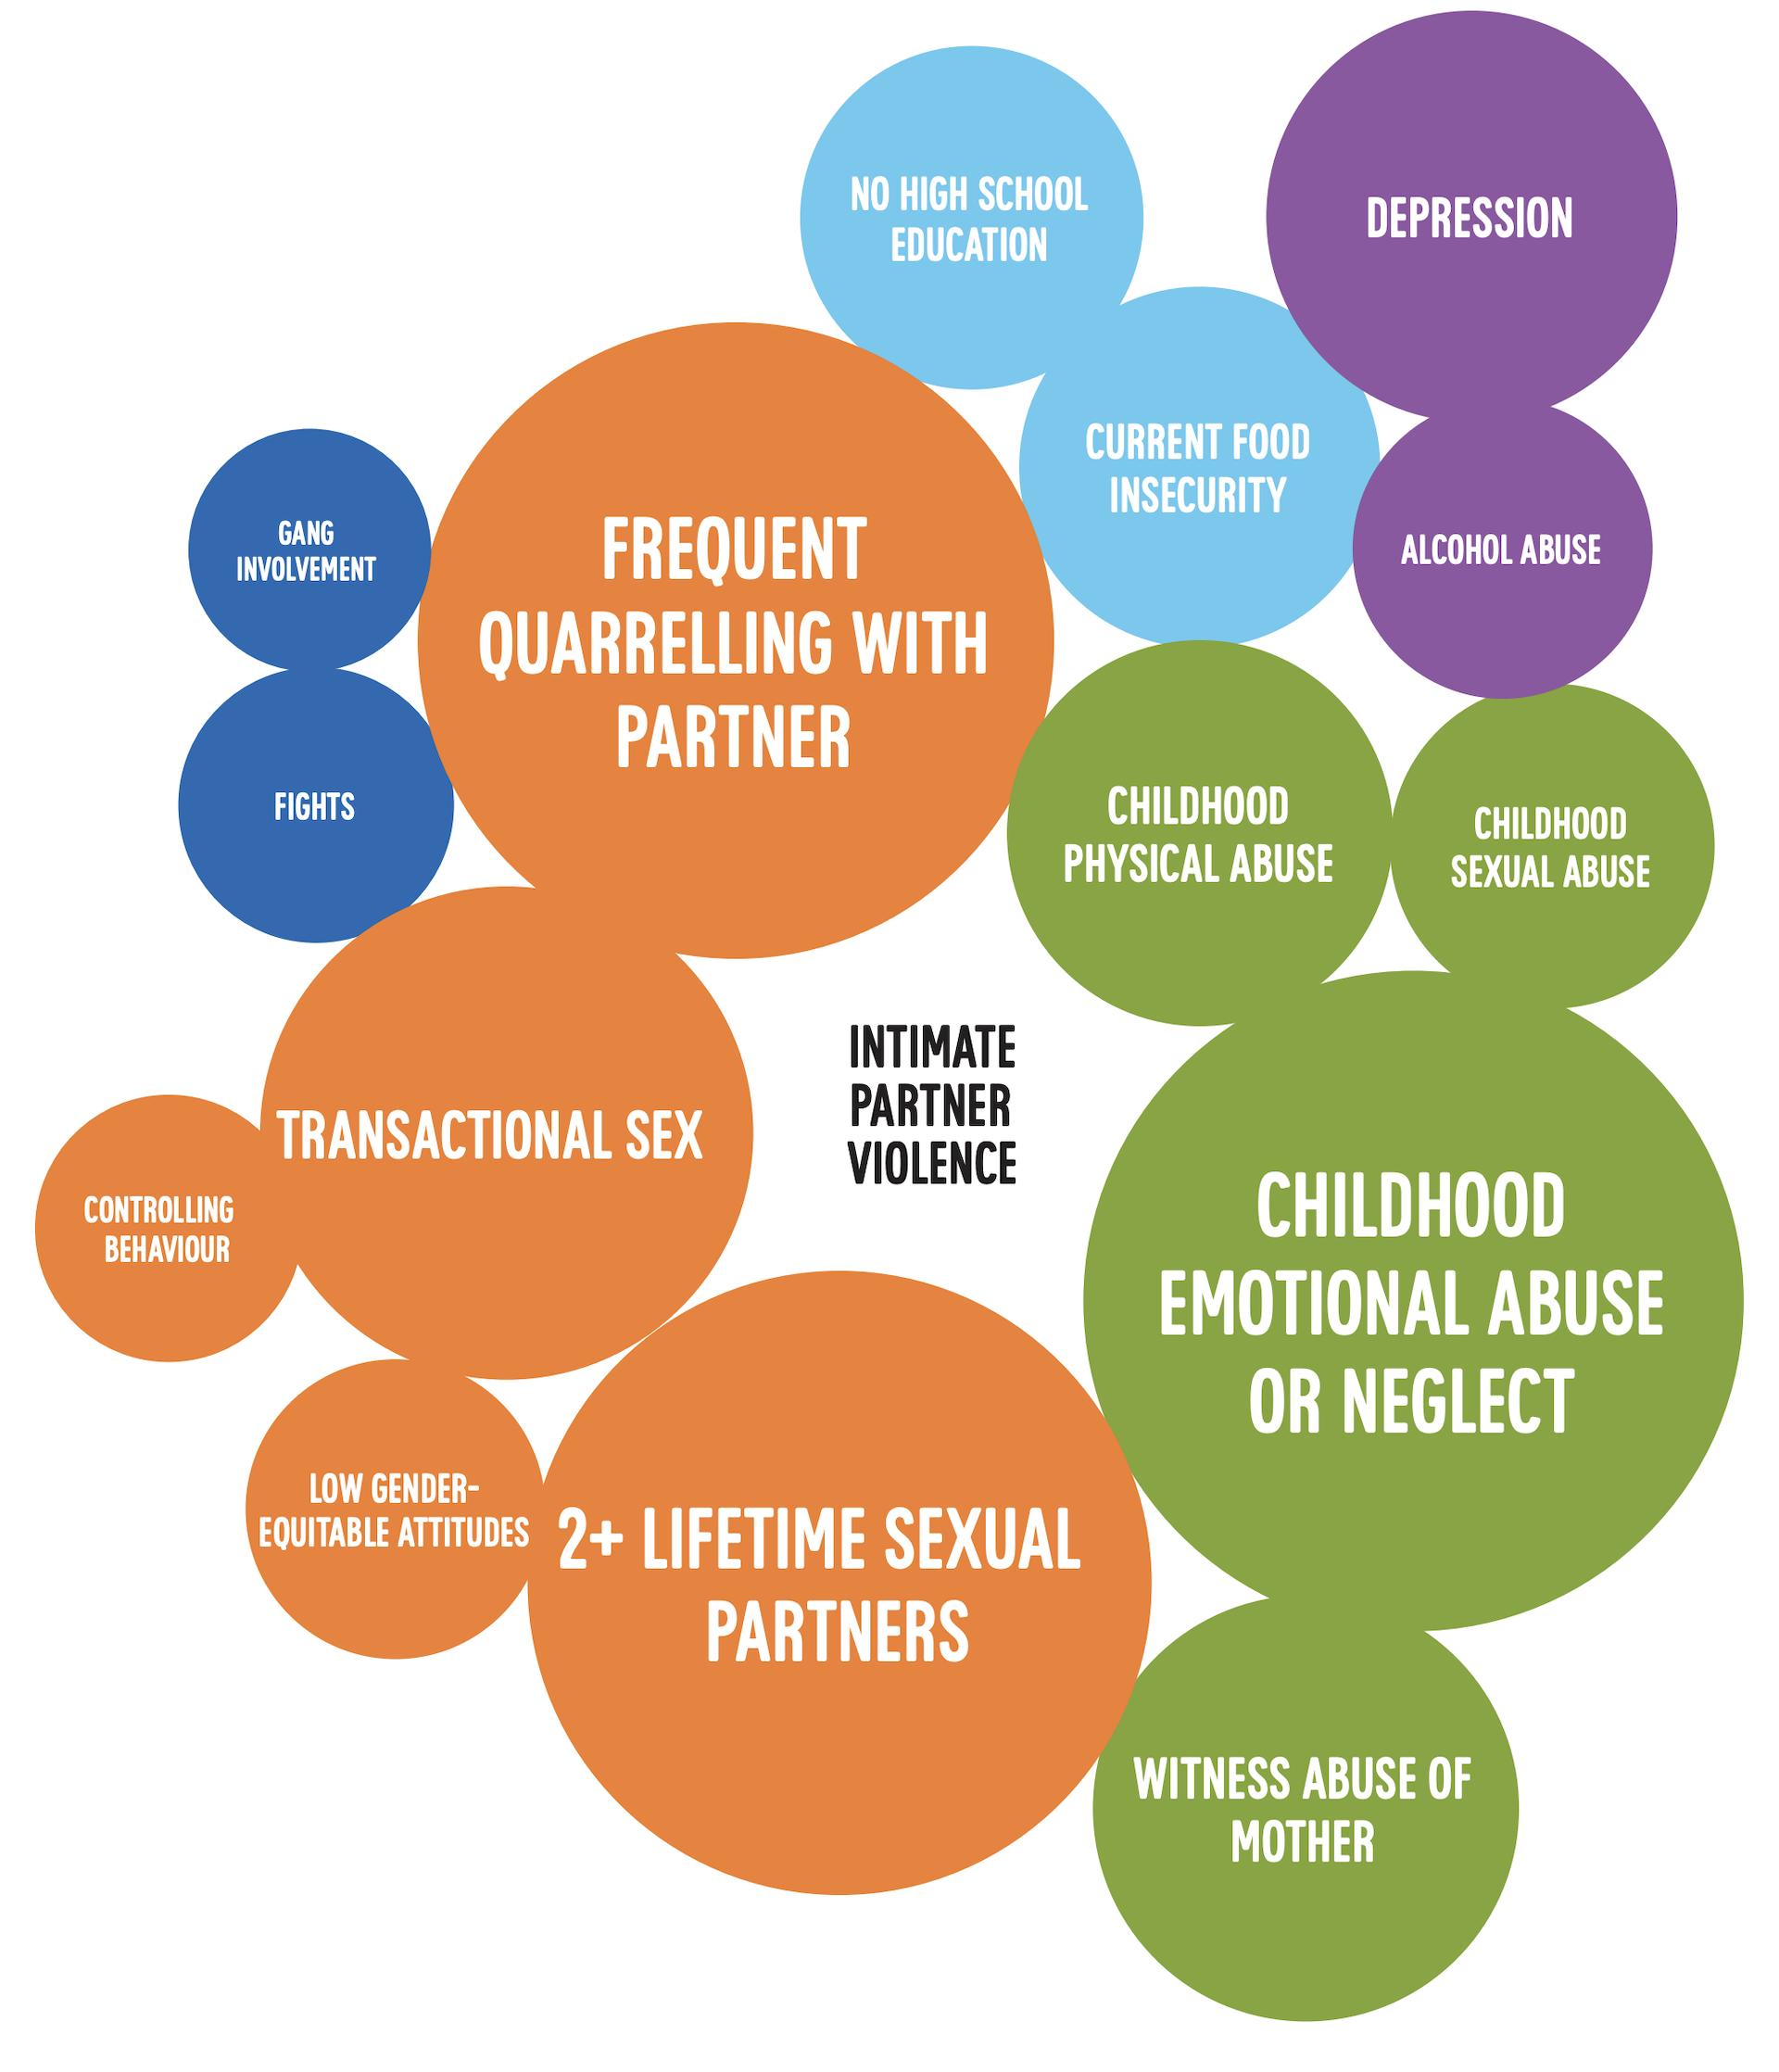 Relative importance of factors explaining intimate partner violence